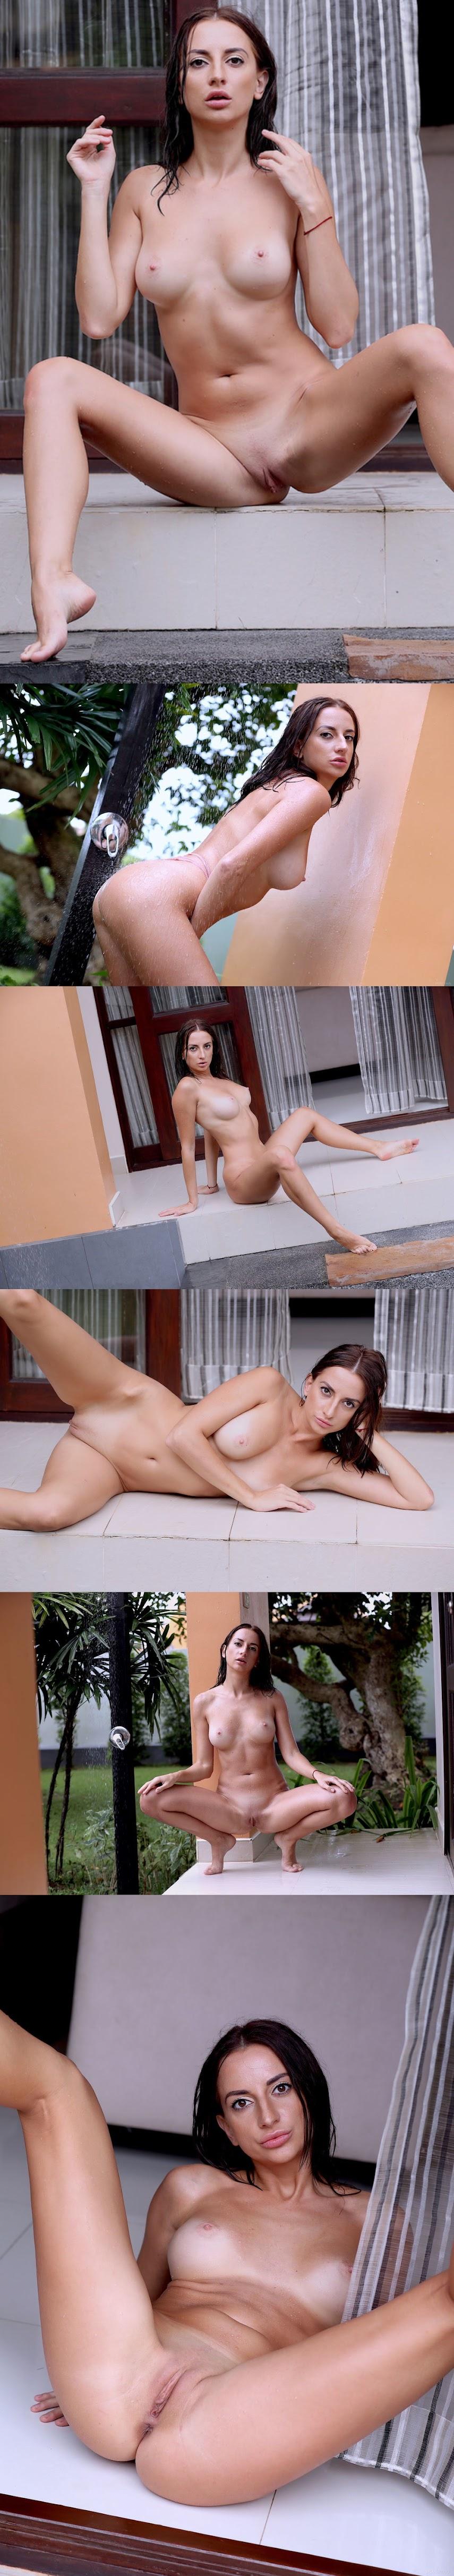 4939808095 [EroticBeauty] Kissin - Pretty Girl eroticbeauty 07140